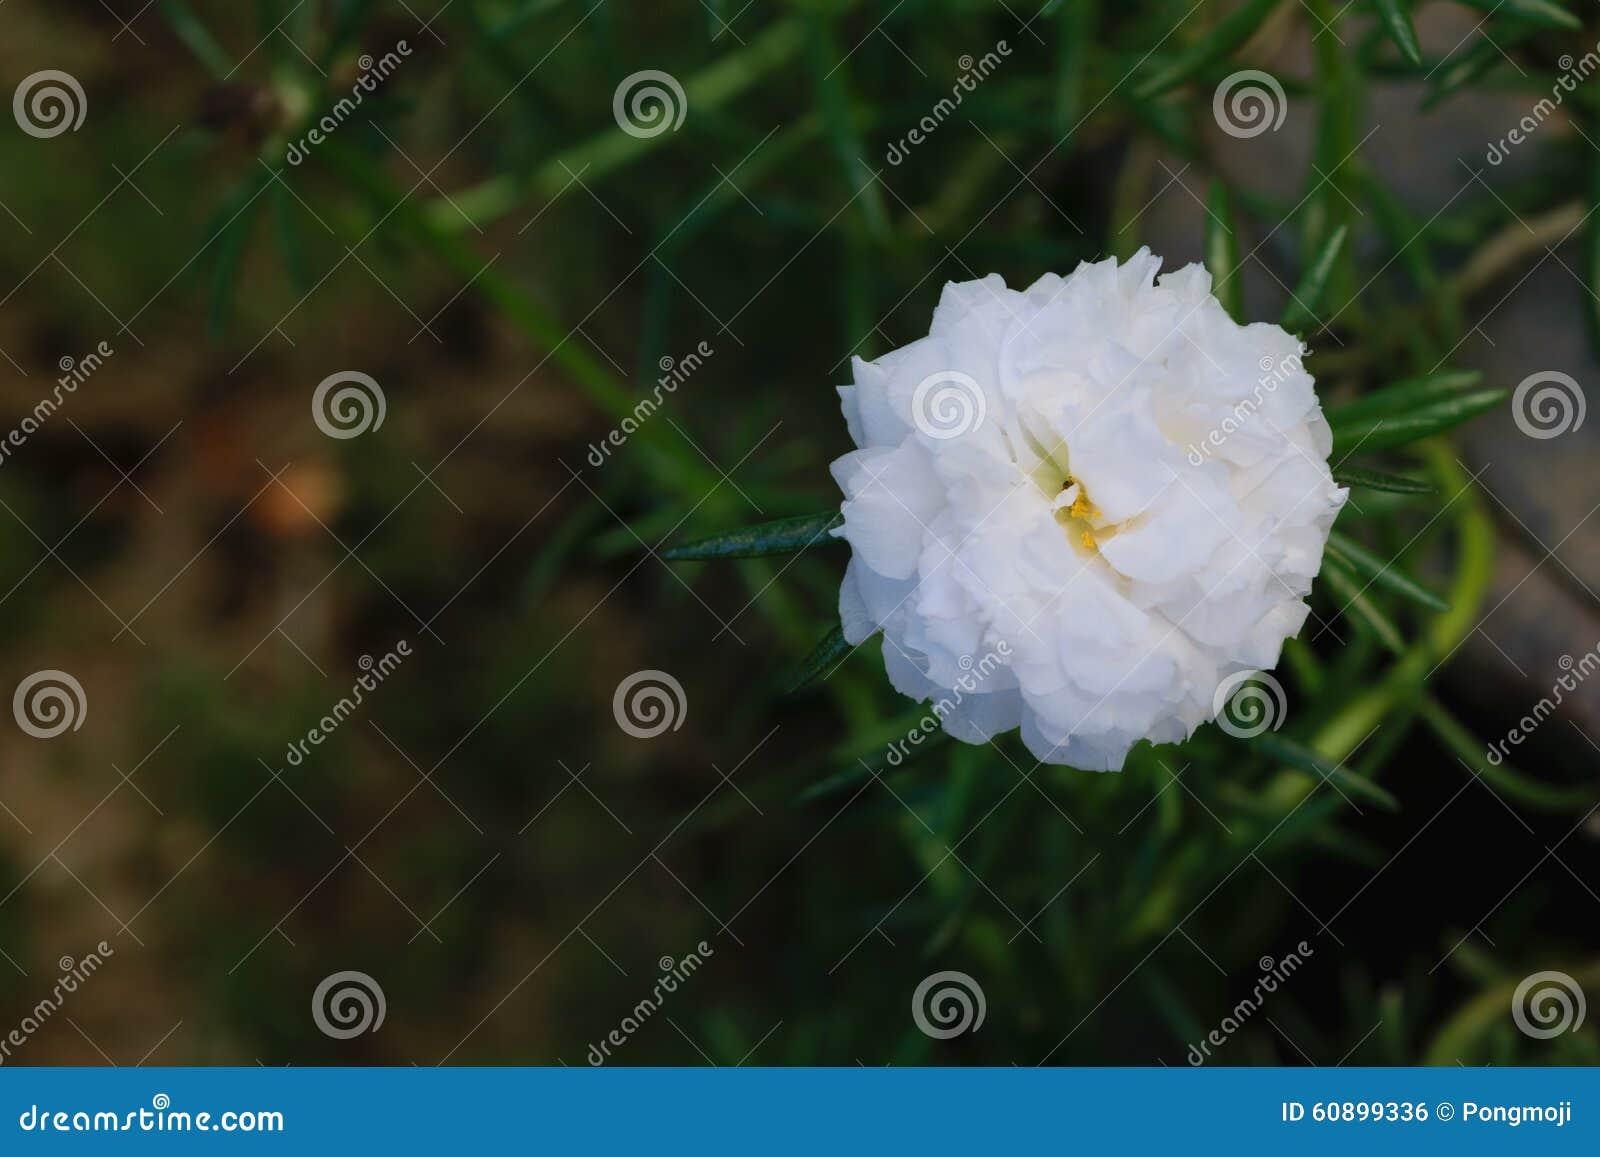 Beautiful White Moss Rose Flower Stock Photo Image Of White Flora